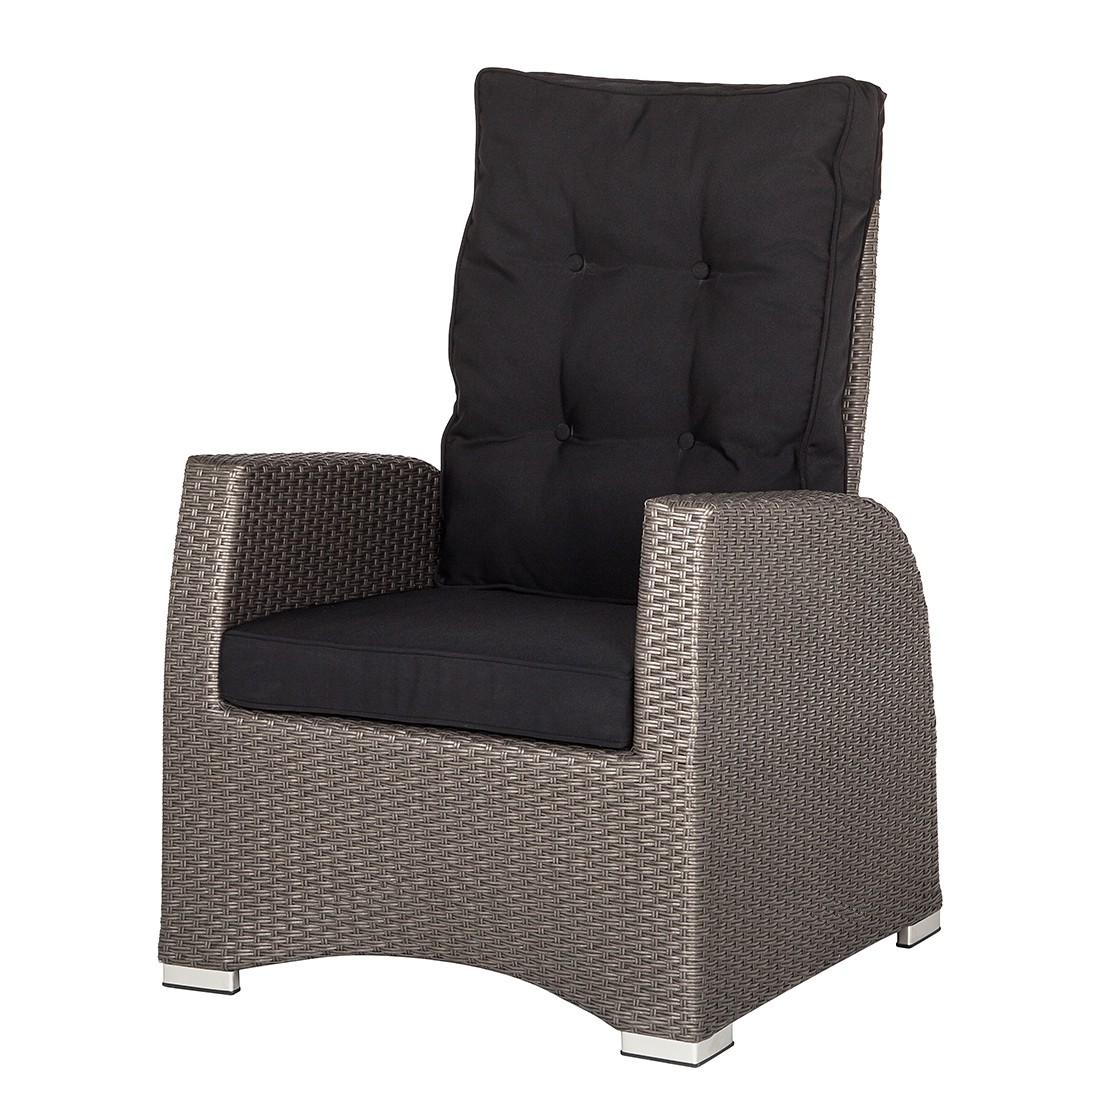 sessel polyrattan grau g nstig kaufen. Black Bedroom Furniture Sets. Home Design Ideas